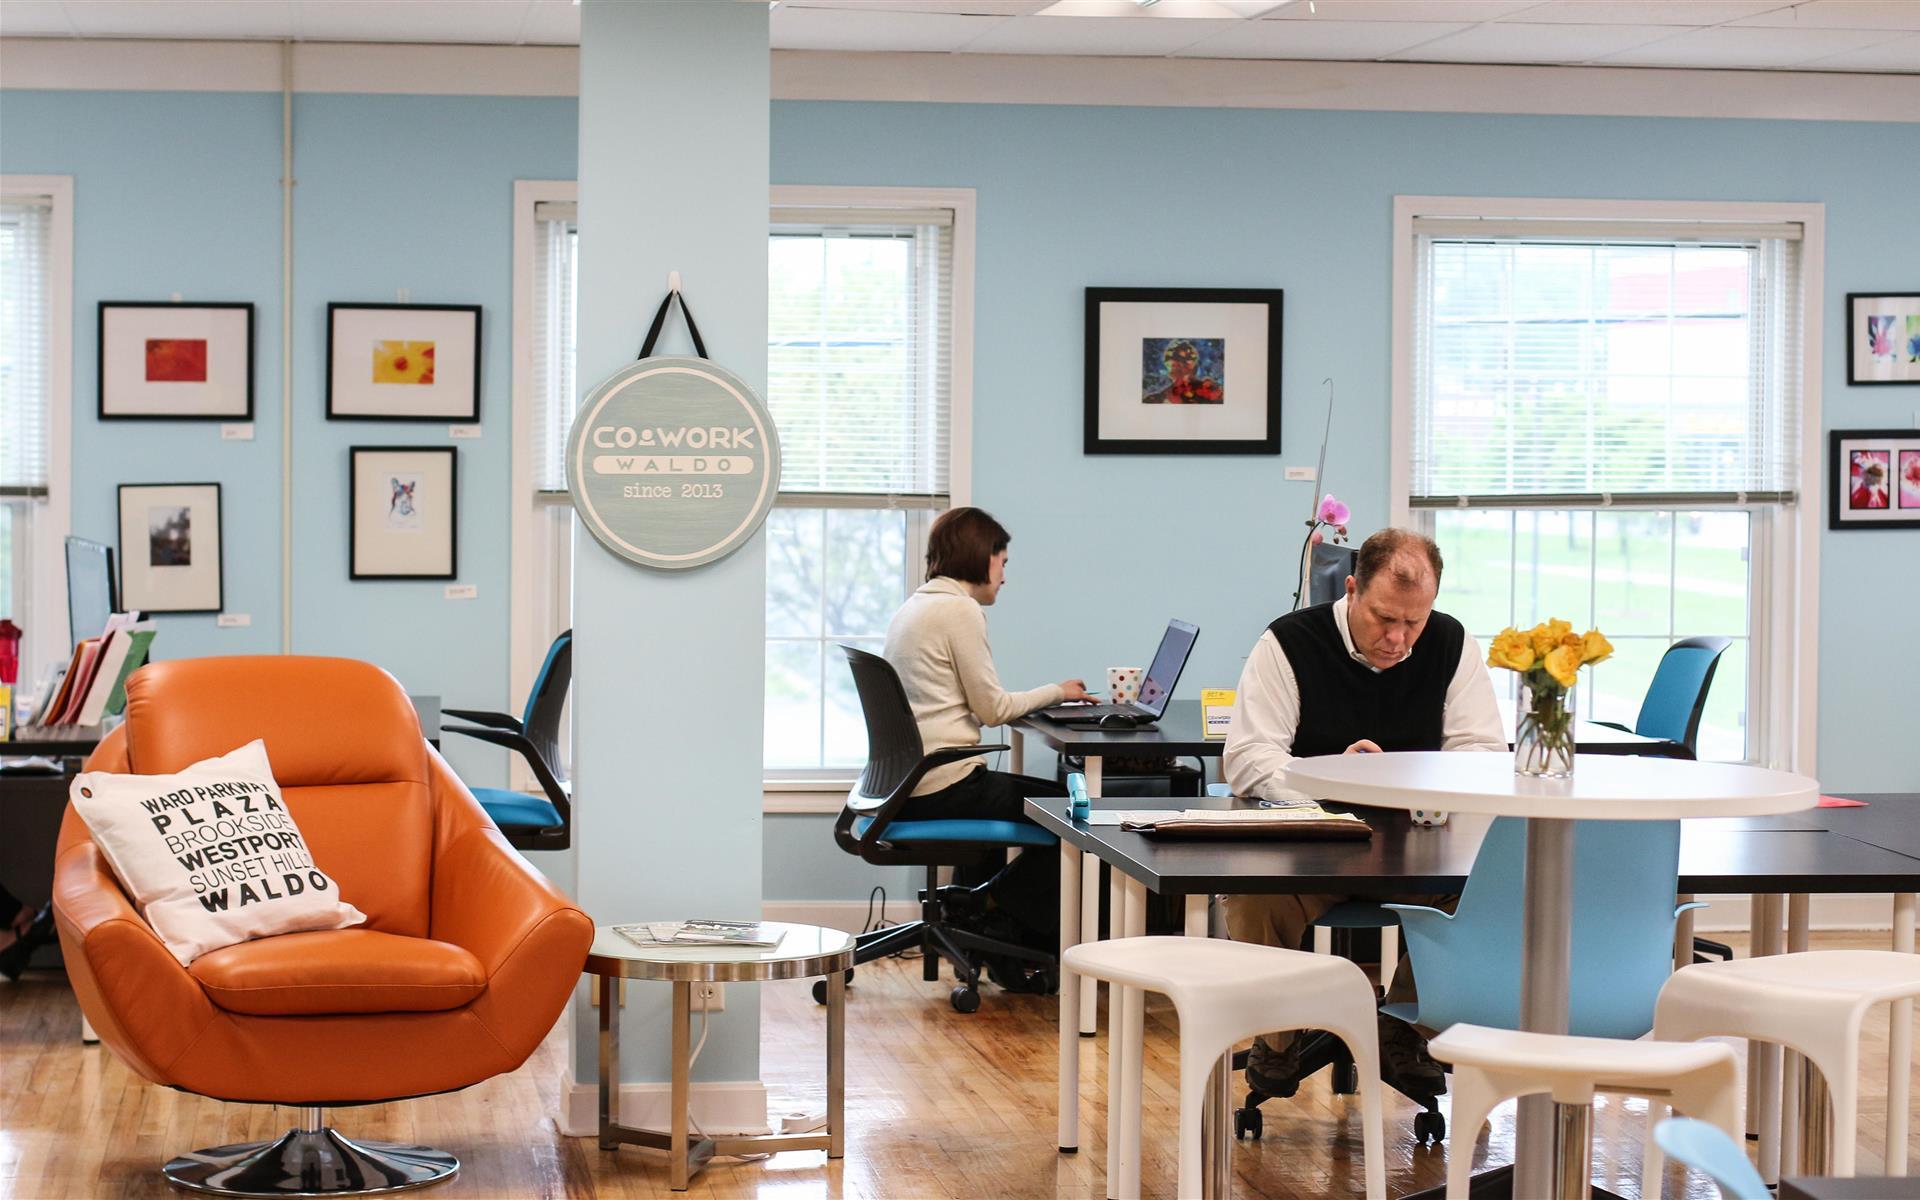 Cowork Waldo - Dedicated Desk Full-Time